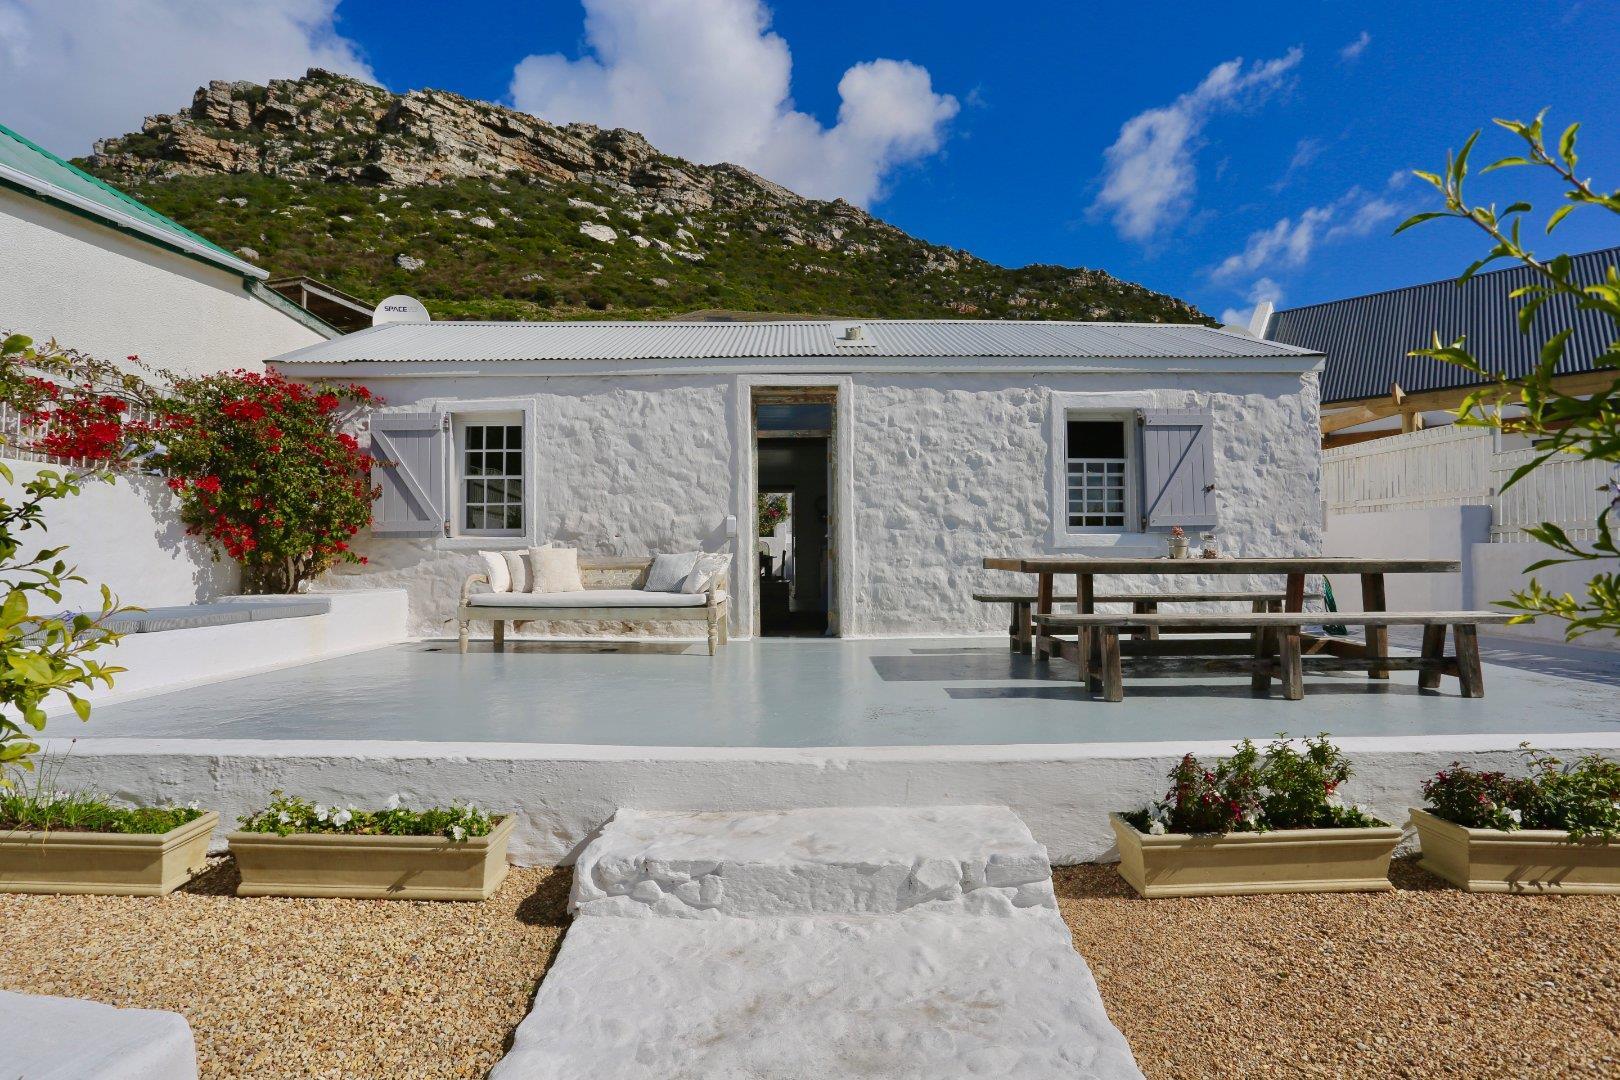 2 Bedroom House For Sale in Kalk Bay